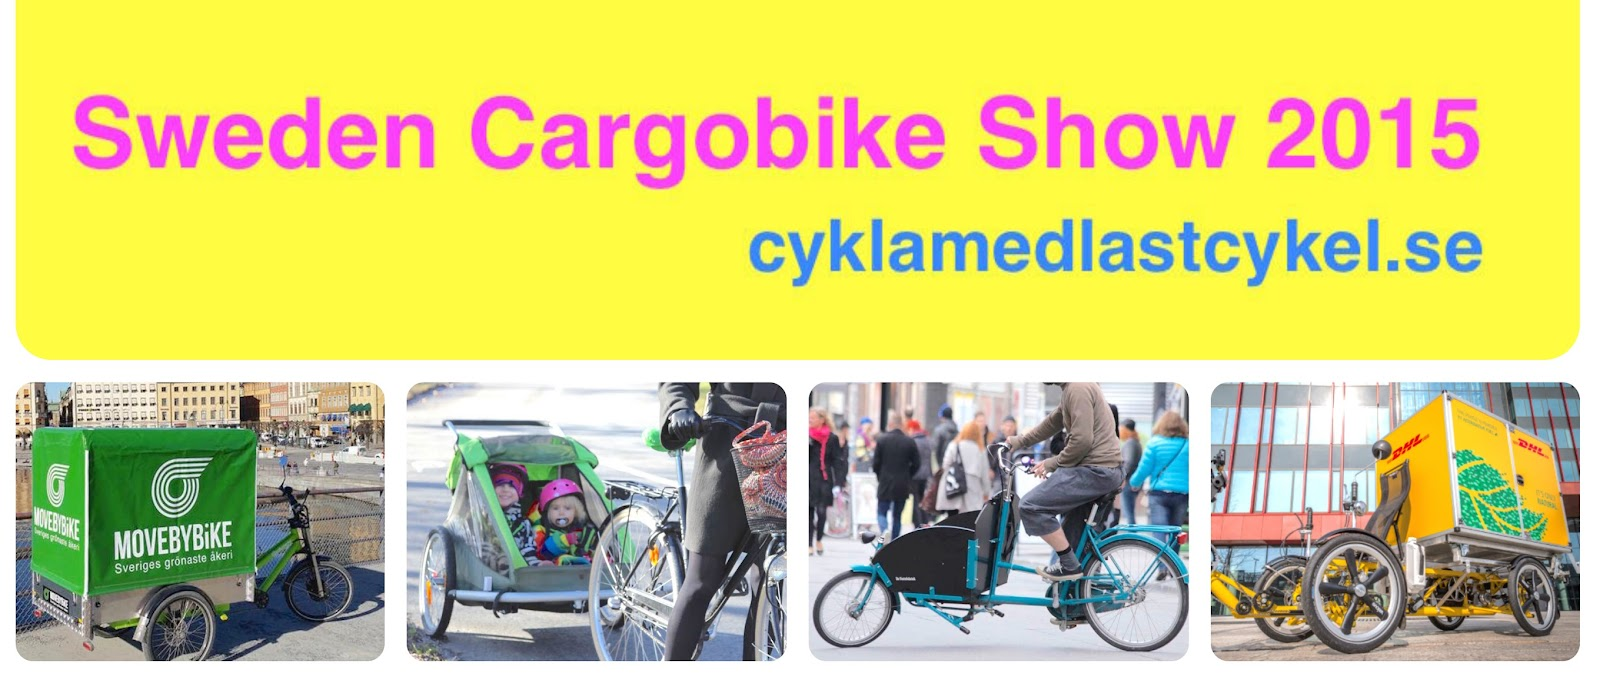 Sweden Cargobike Show 2015